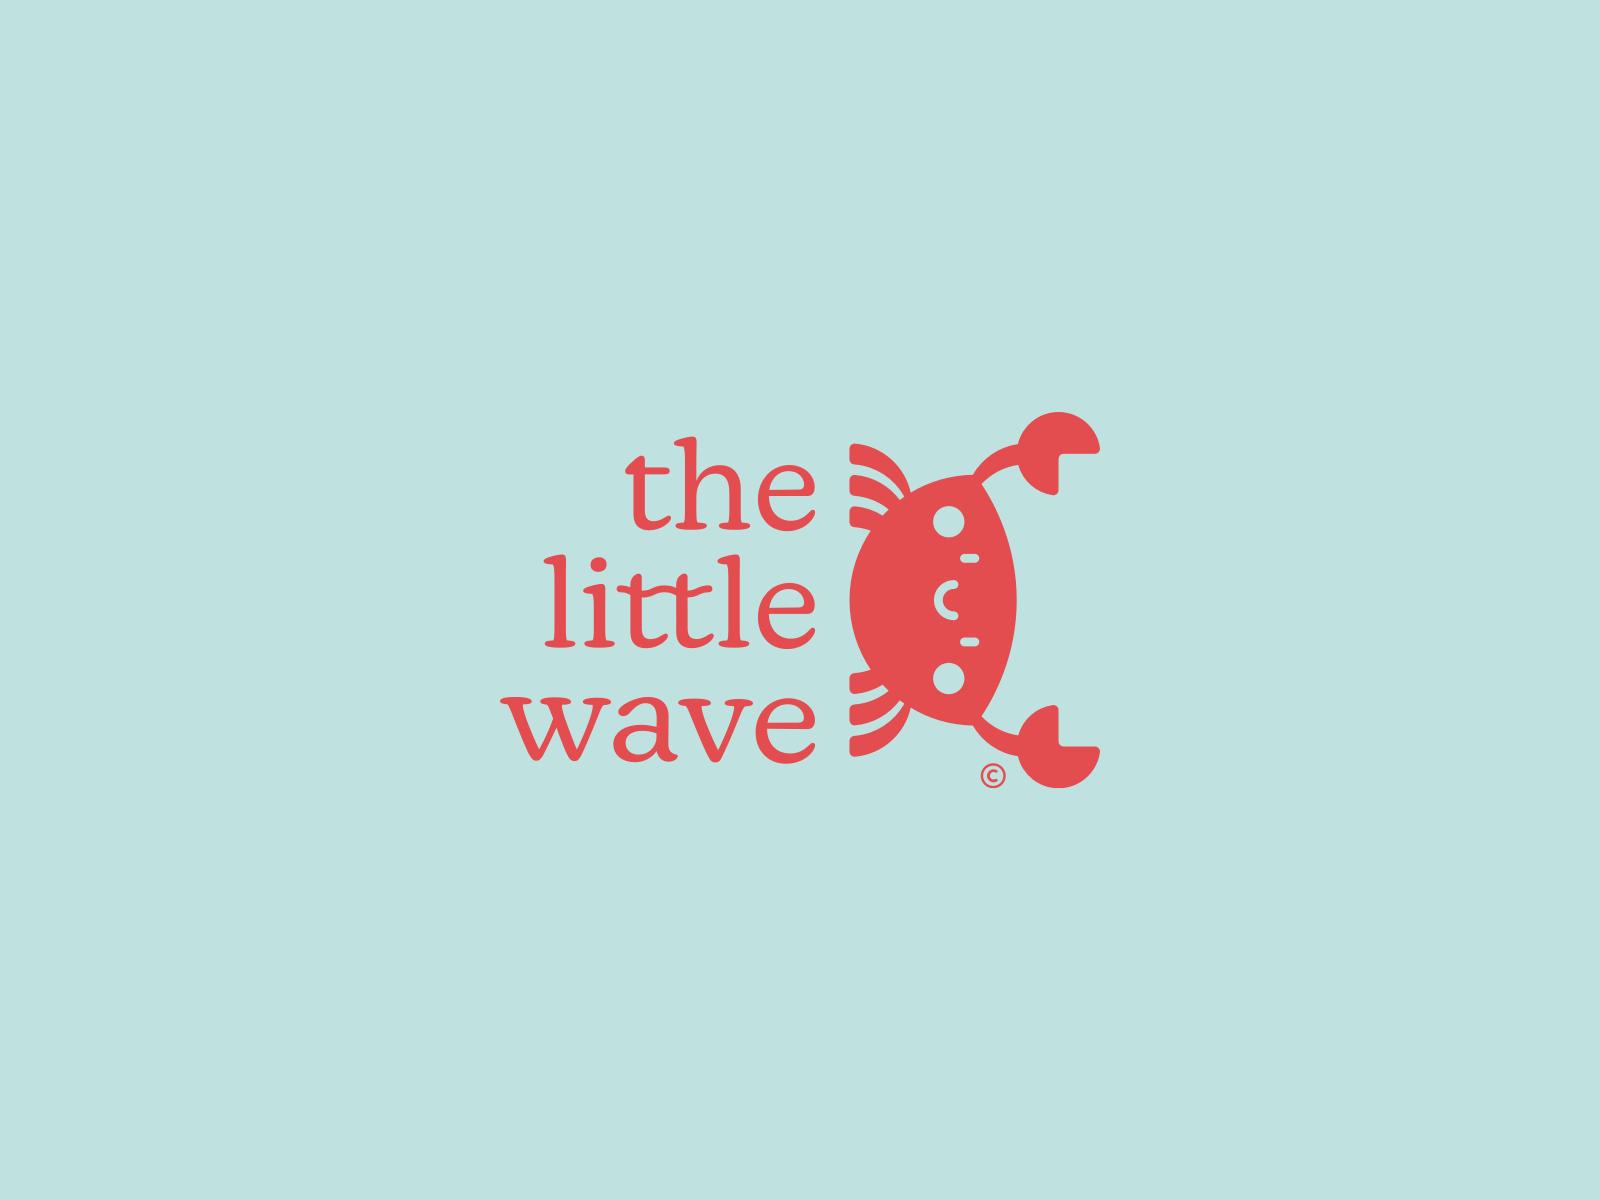 The Little Wave: Alternate logo lock-up